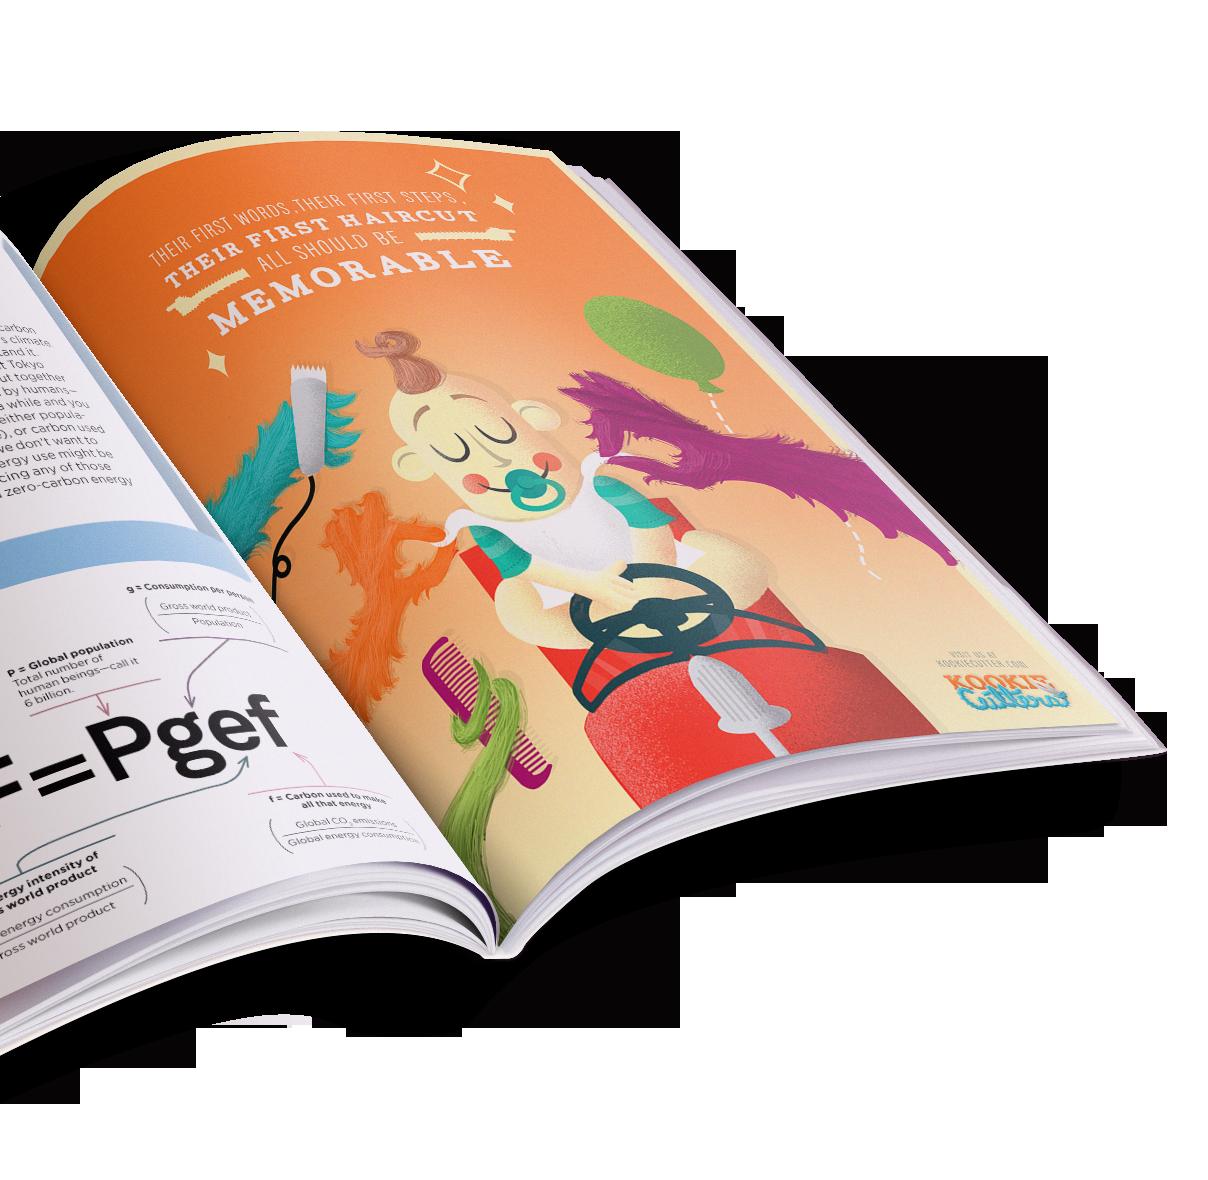 Kookie cutes magazine mock ups.png